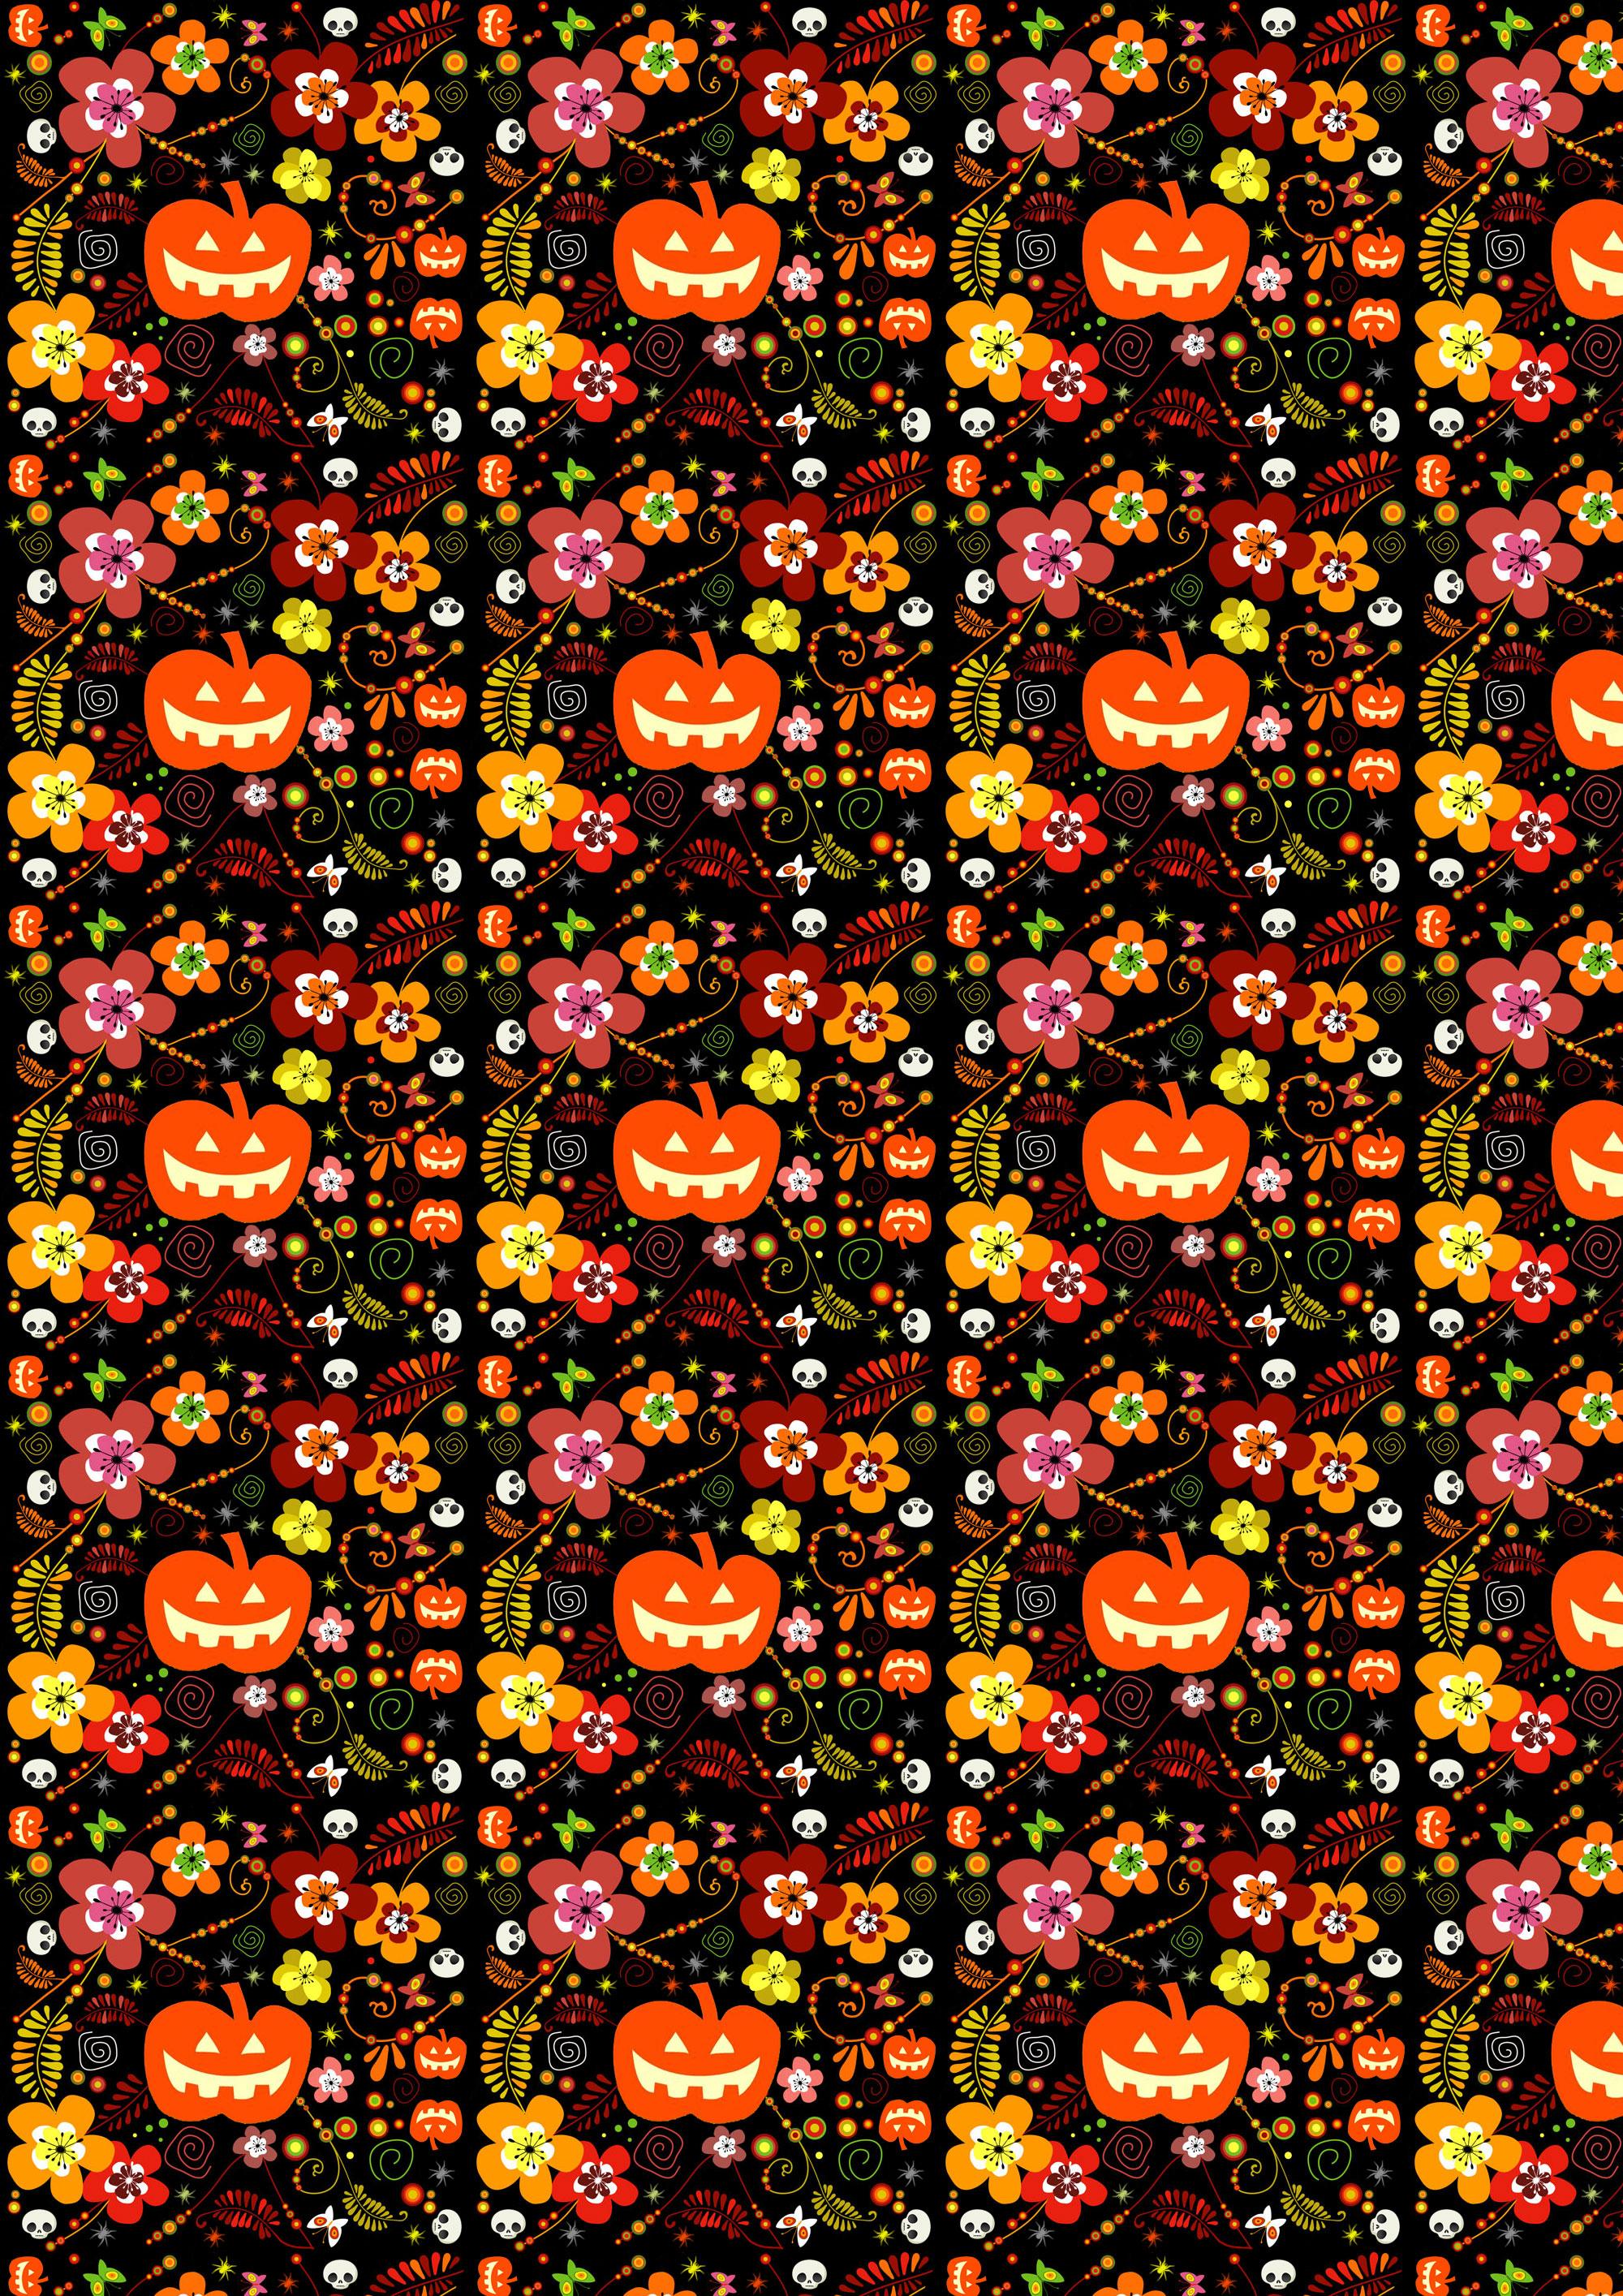 Free Scrapbook Paper: Halloween Pumpkins And Flowers   Rooftop Post - Free Printable Halloween Paper Crafts